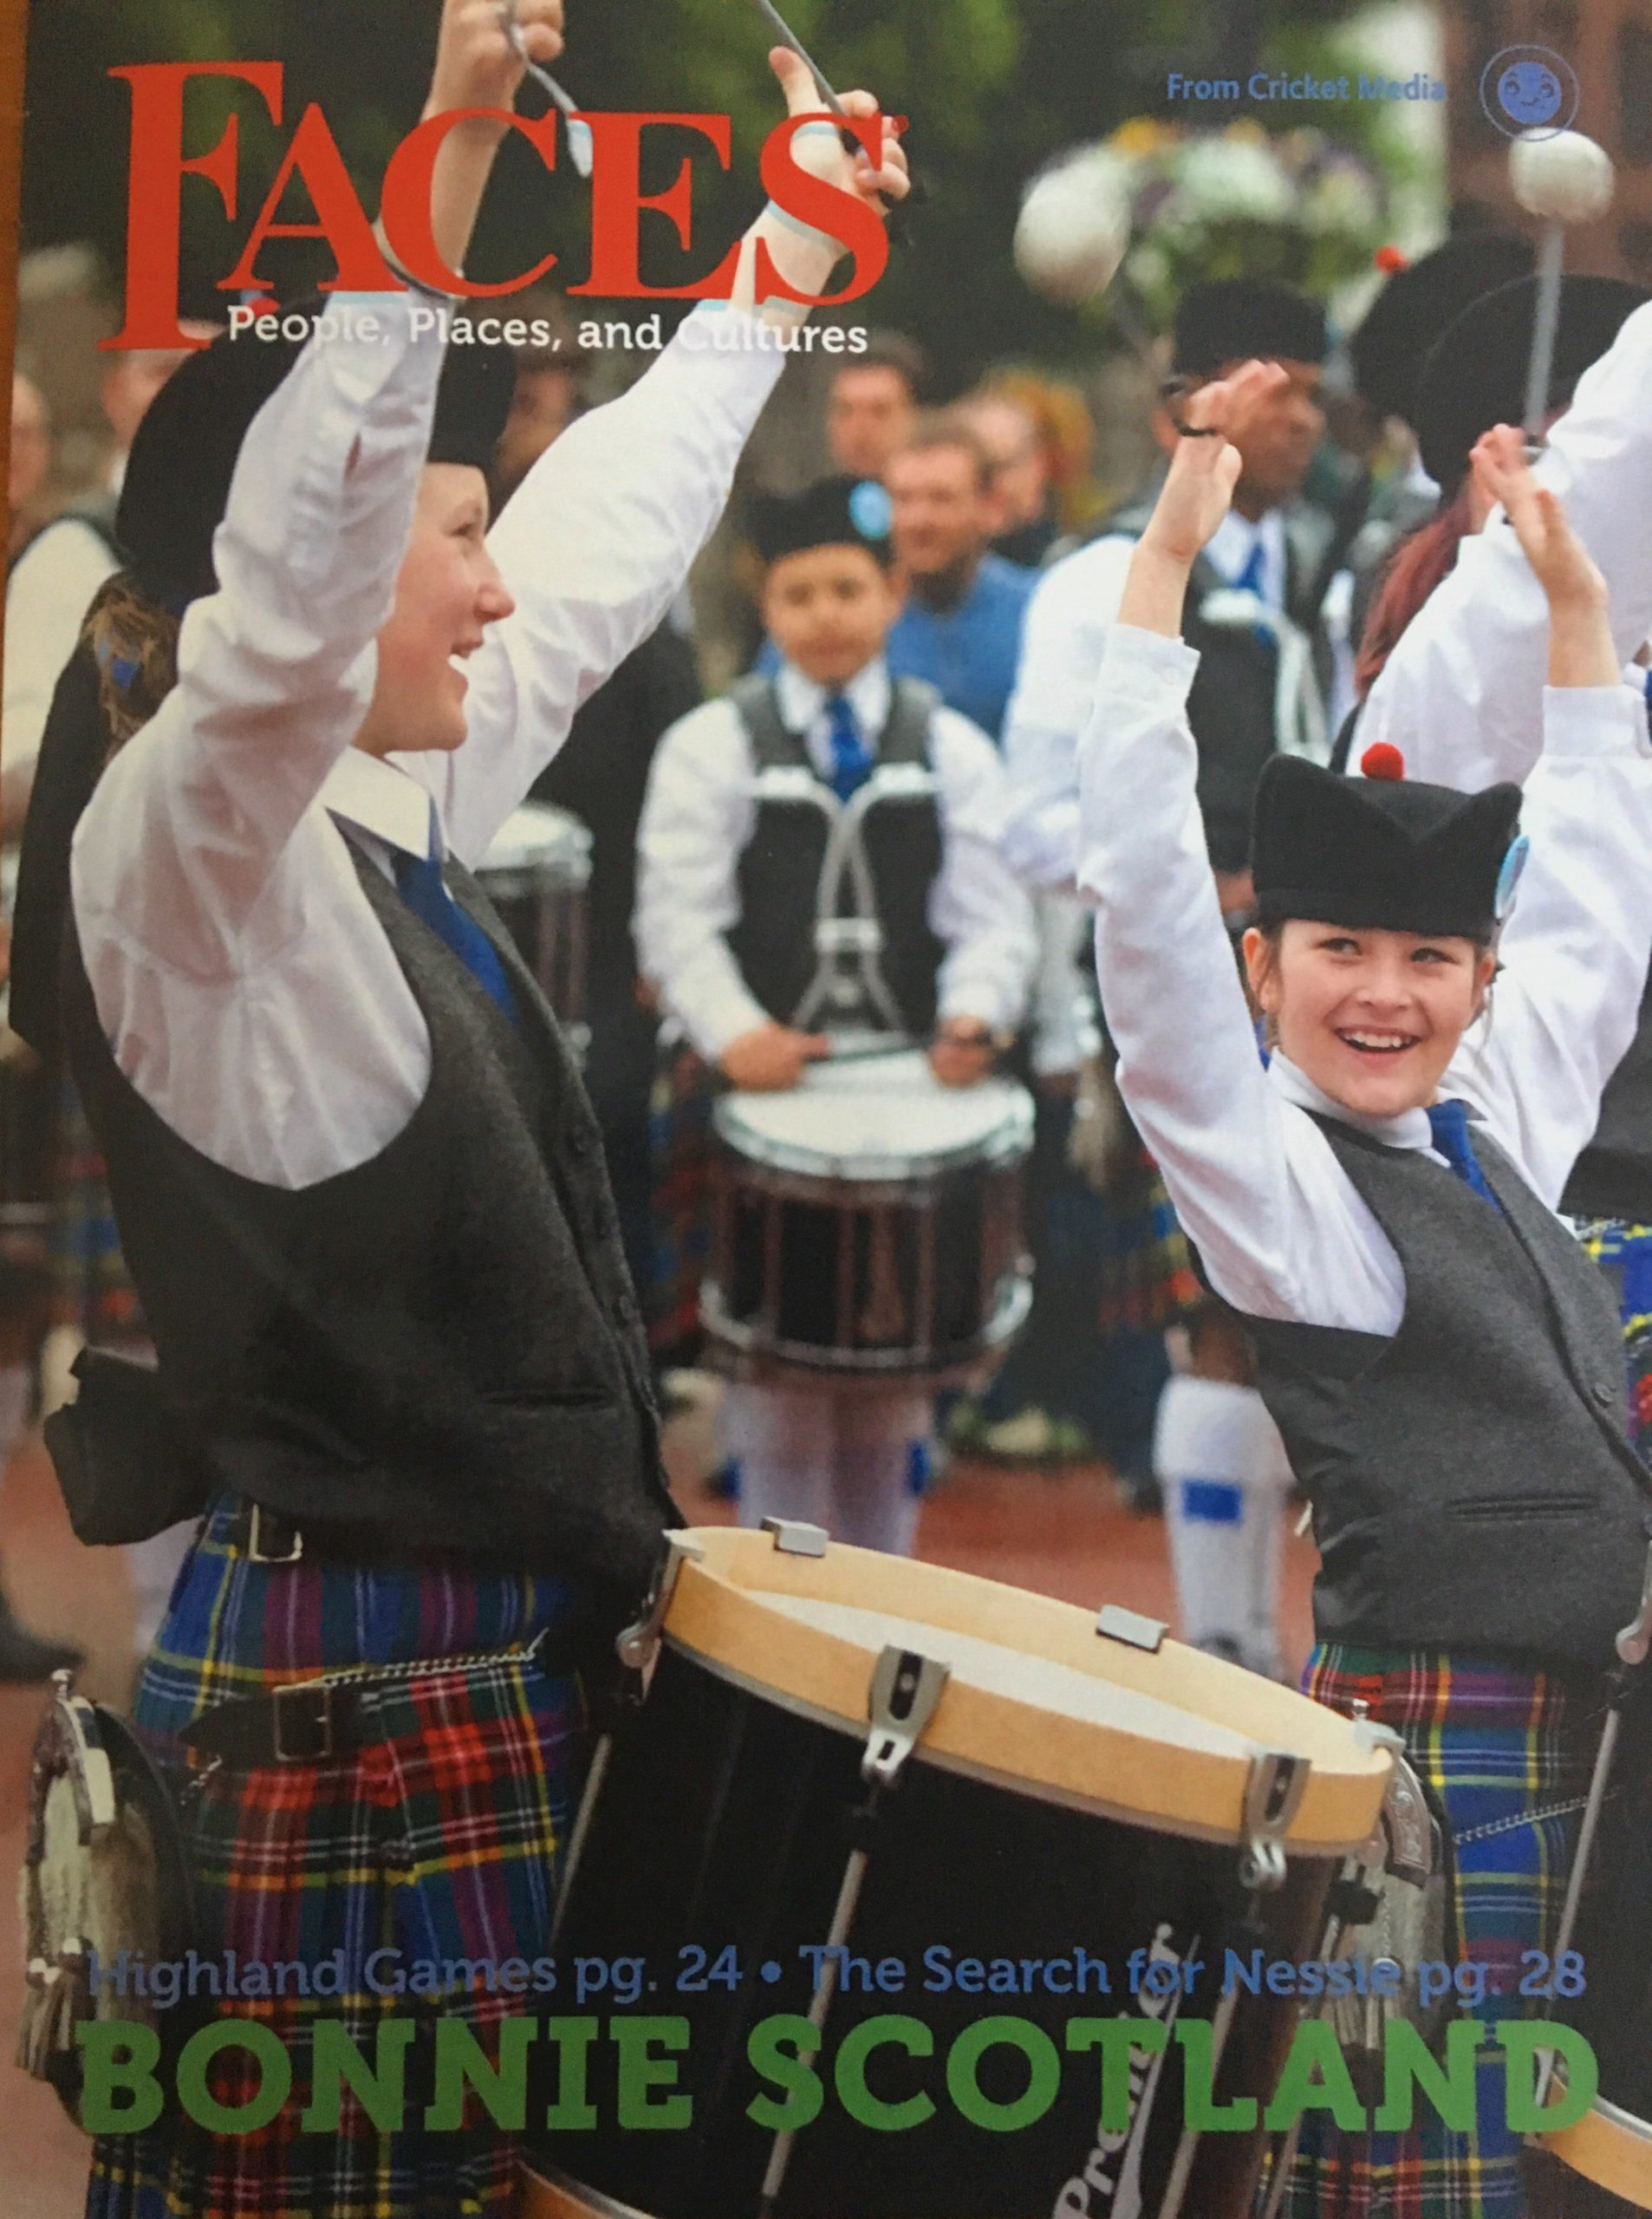 FACES Magazine, Bonnie Scotland, Feb. 2018